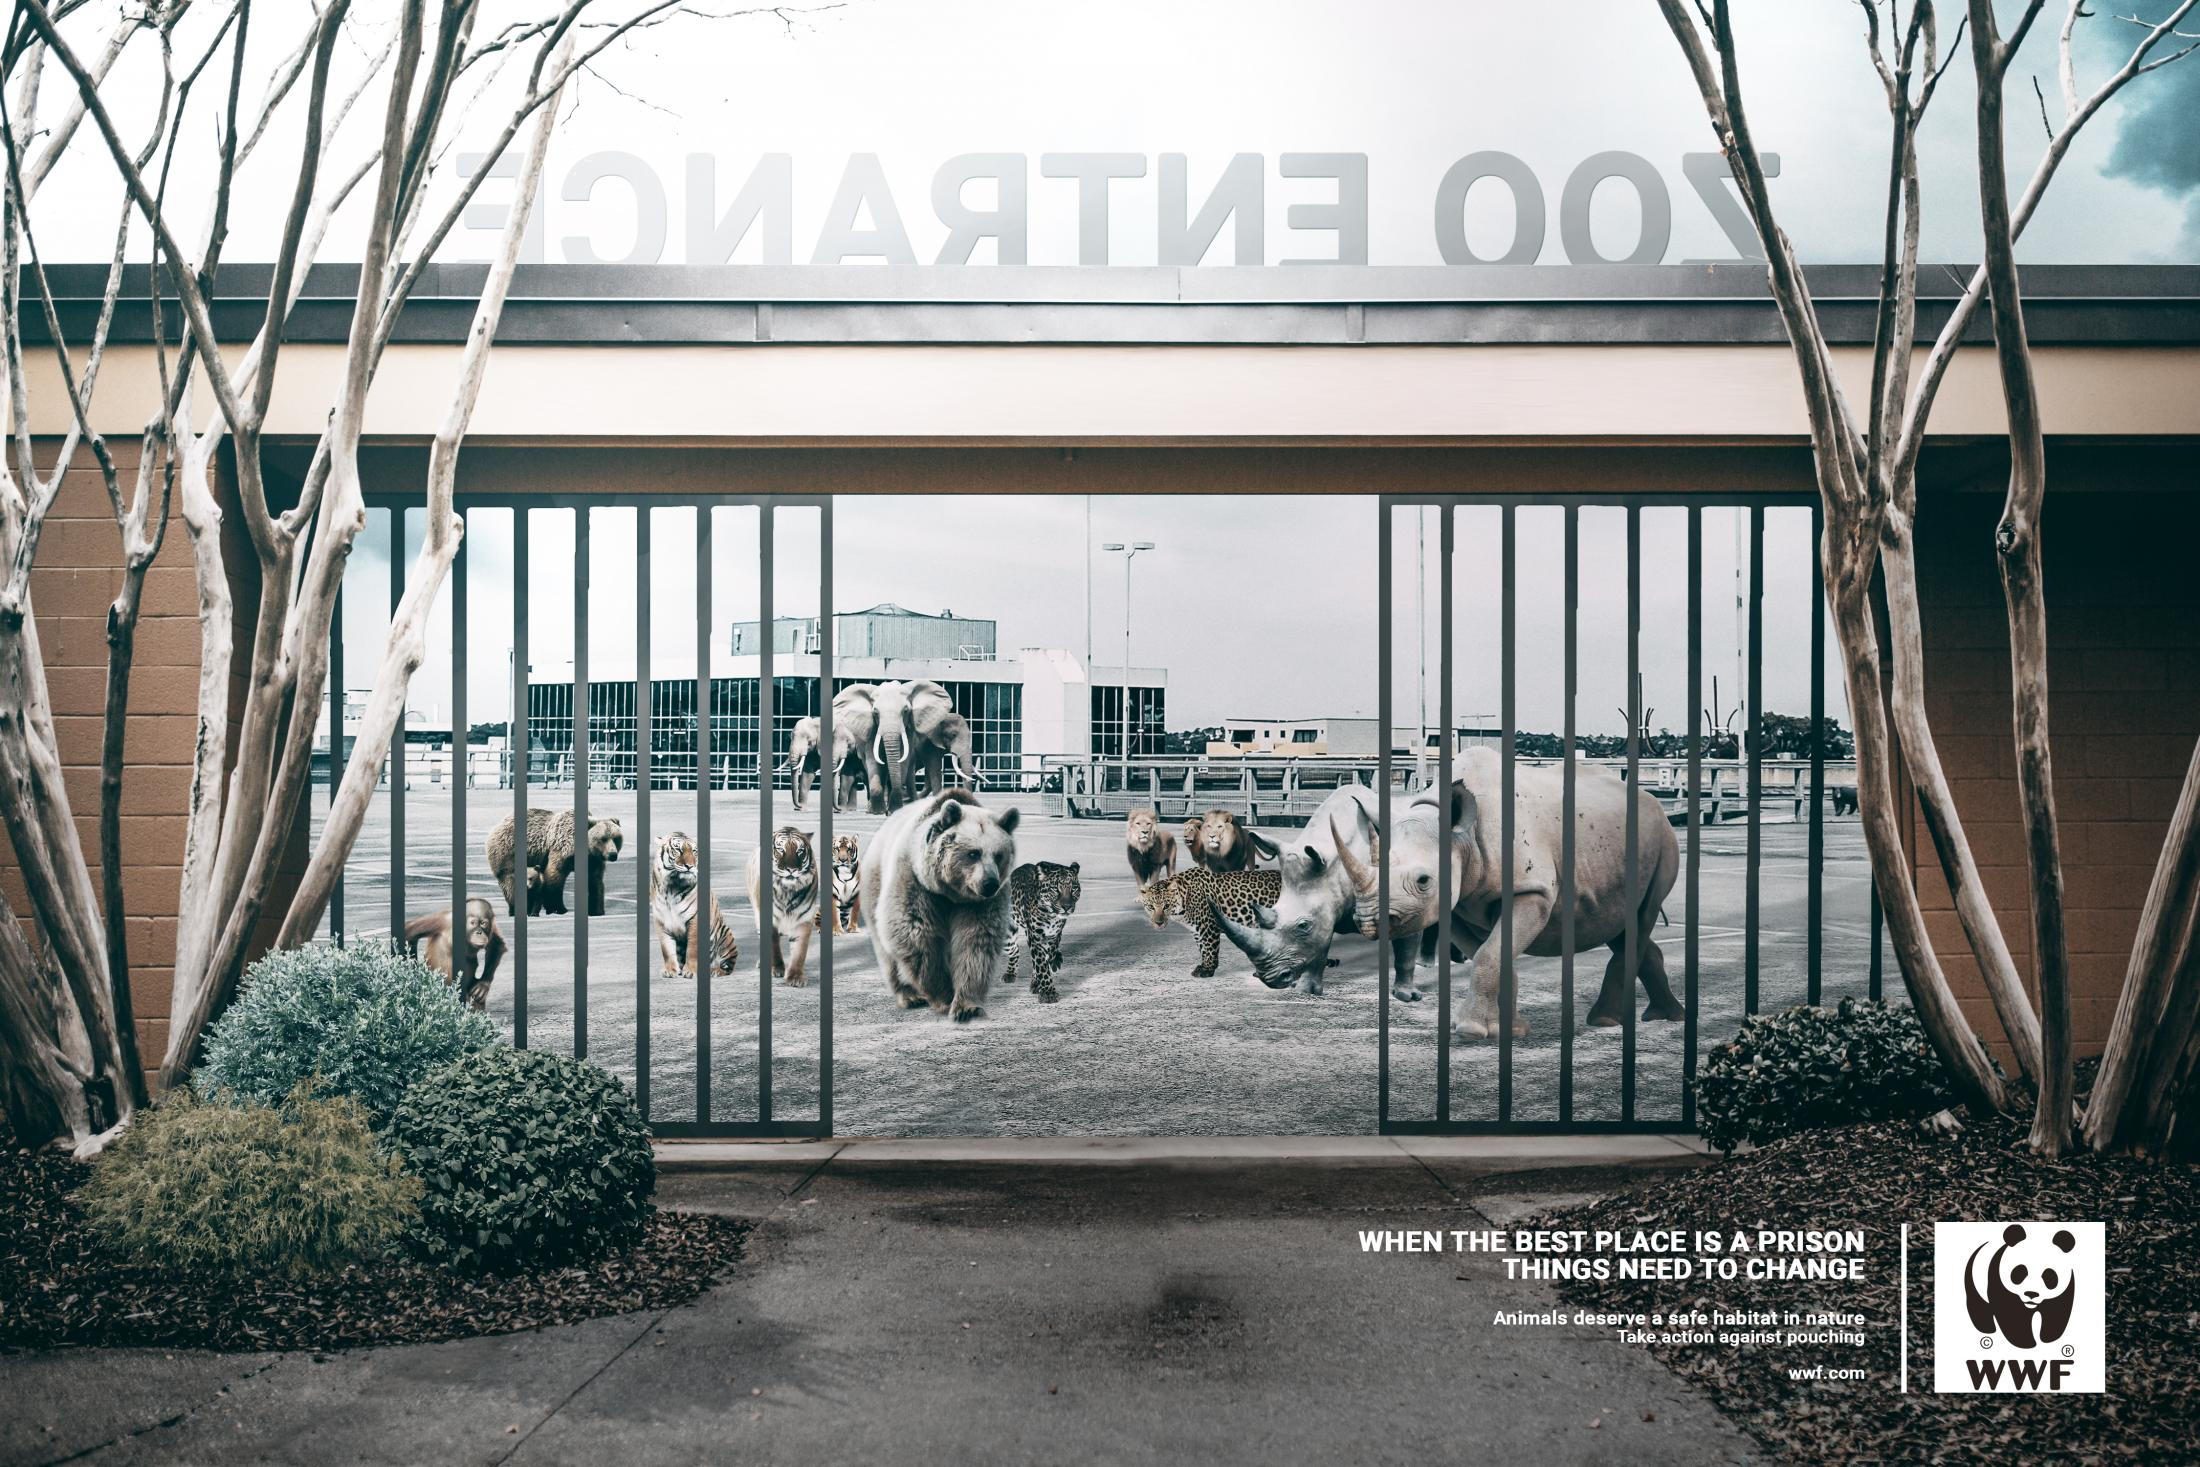 WWF Print Ad - Best in Prison